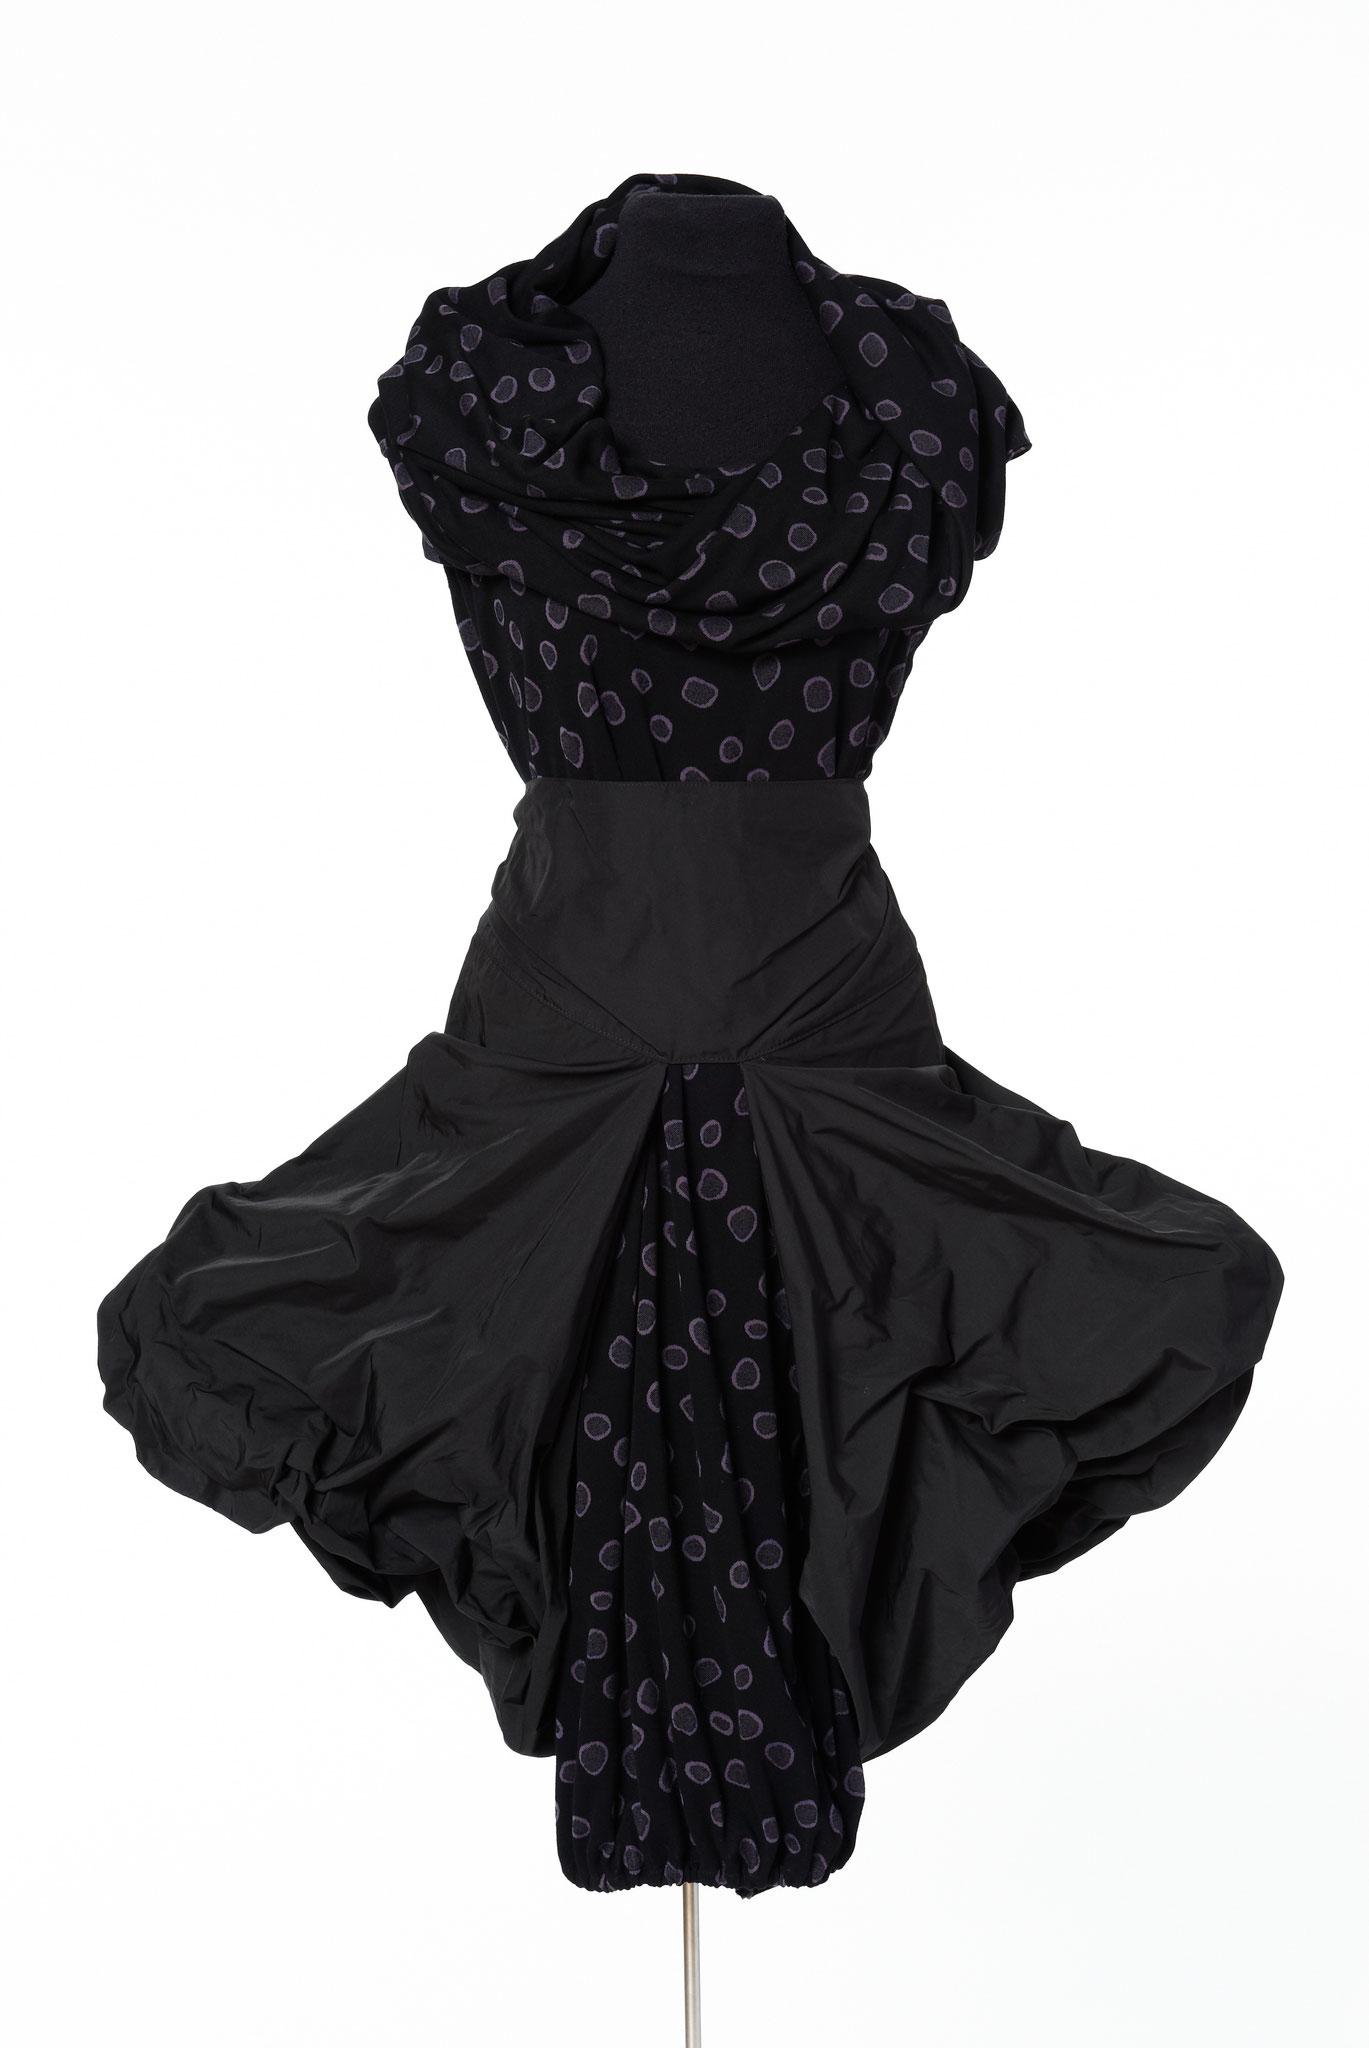 3-teiliges Outfit: Rock, Mogler, Schal. Material: Baumwolle/Elastan/ Mikrofaser